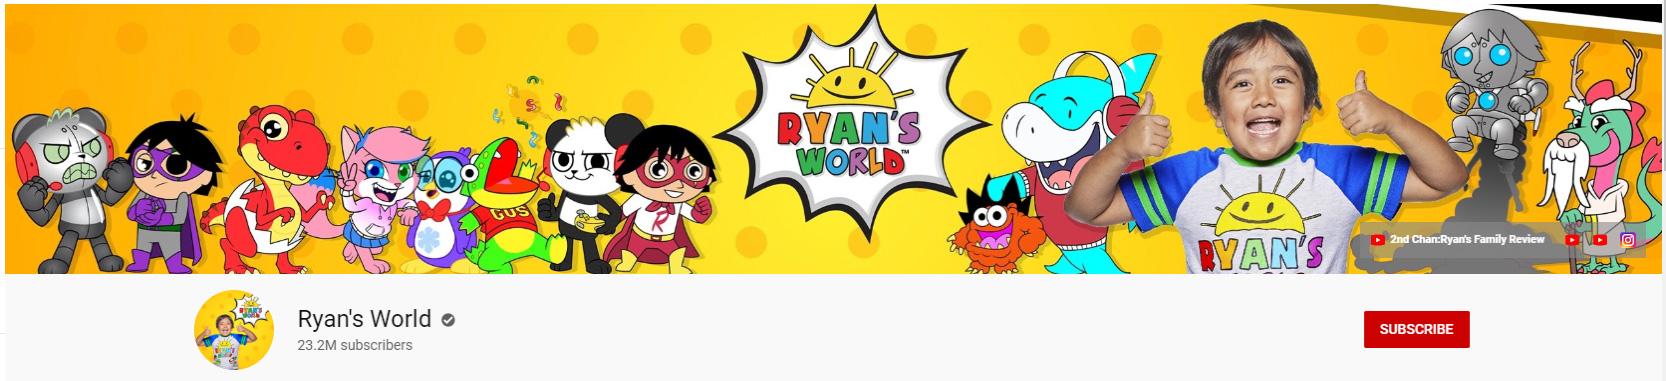 ryans world youtube